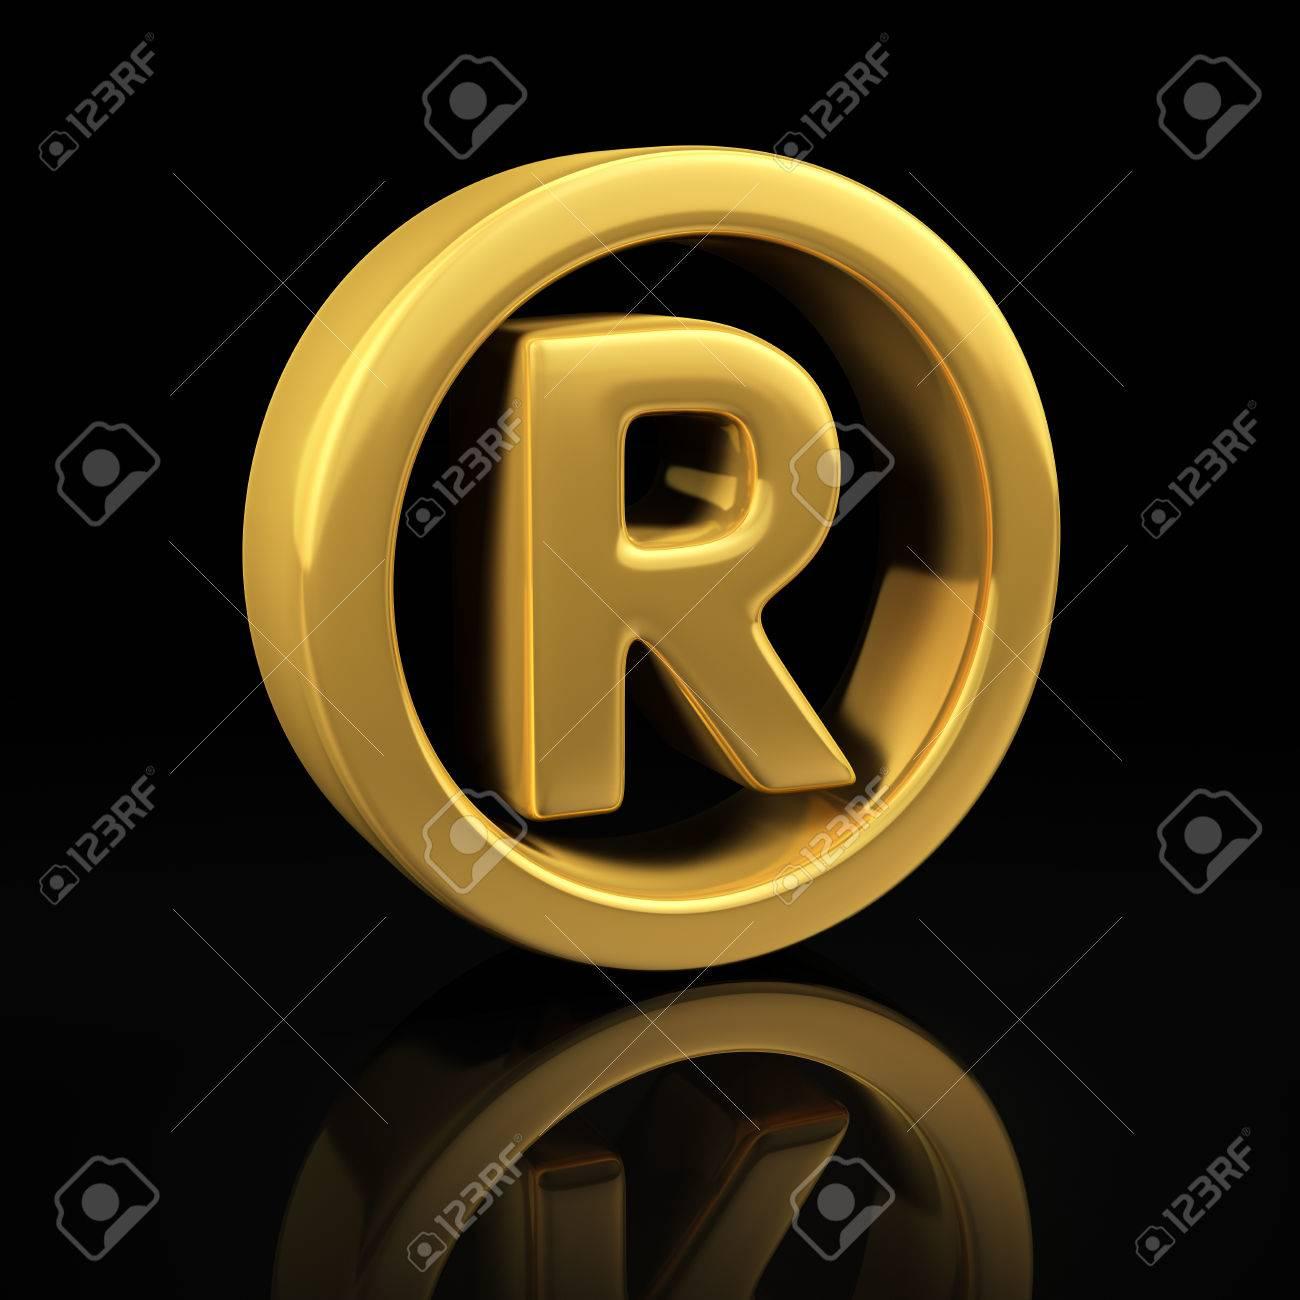 Registered trademark gold symbol on a black background with registered trademark gold symbol on a black background with reflection stock photo 26566306 biocorpaavc Gallery